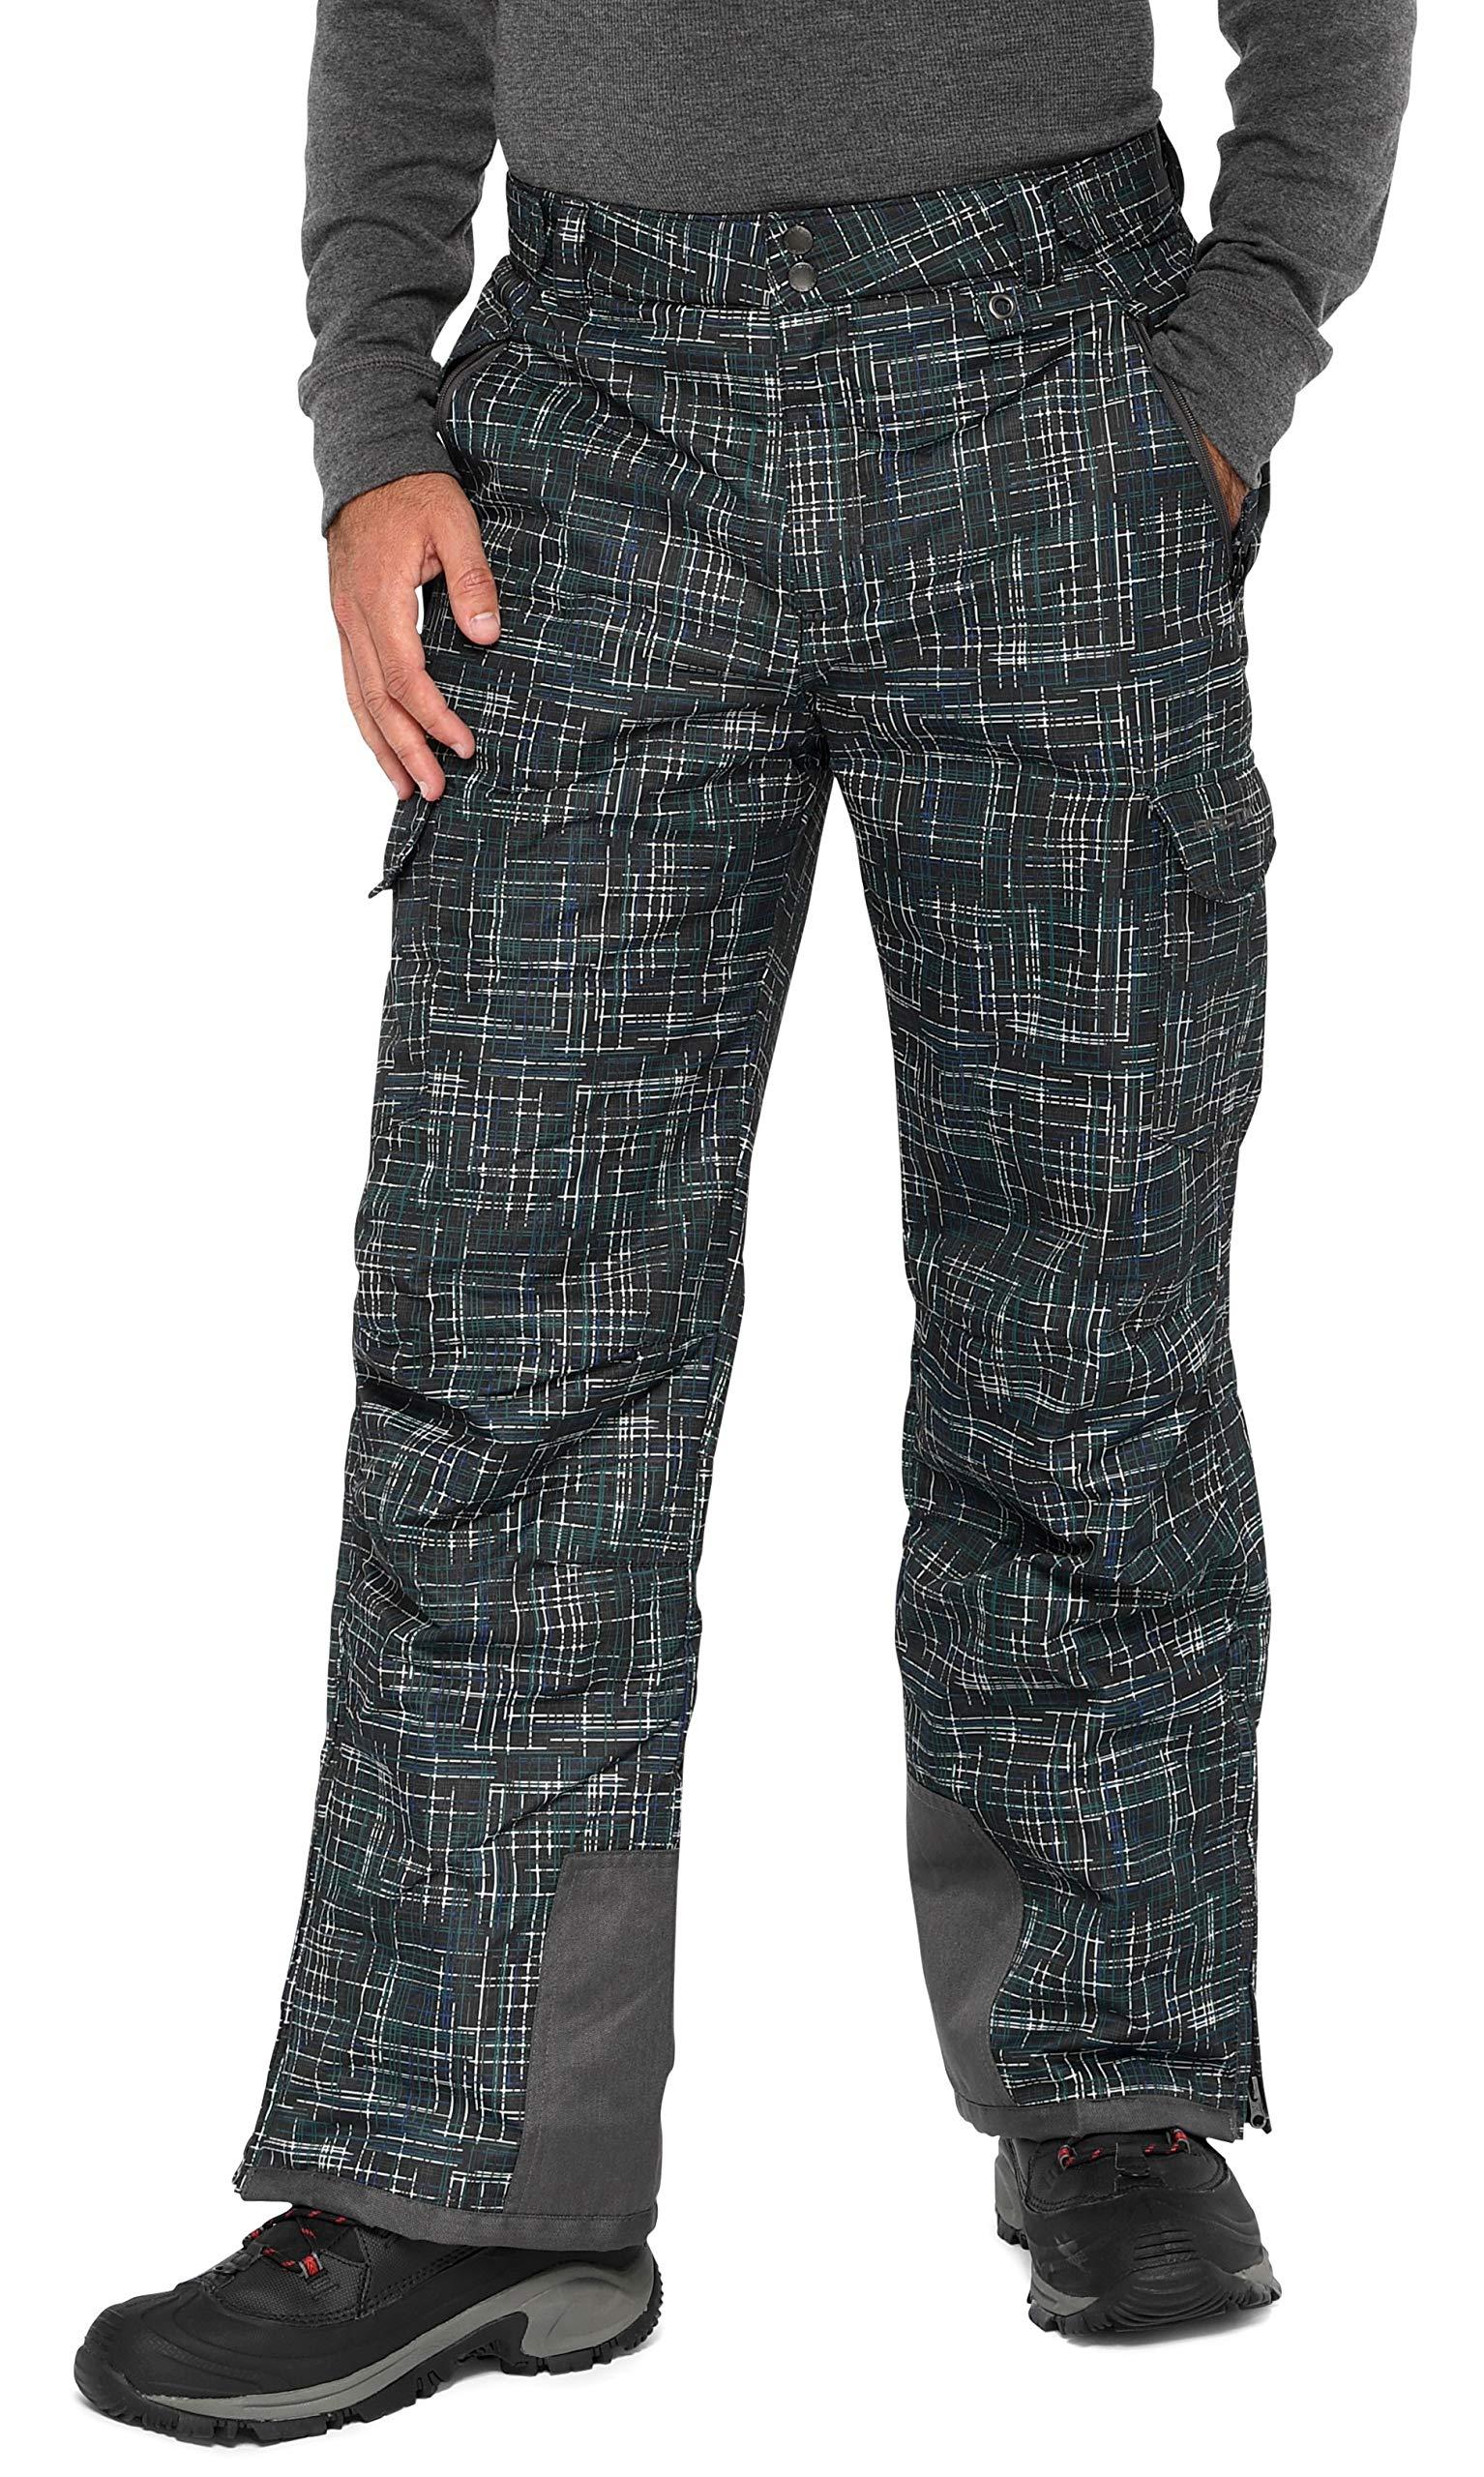 Arctix Men's Snow Sports Cargo Pants, Blizzard Print Black, Large/Regular by Arctix